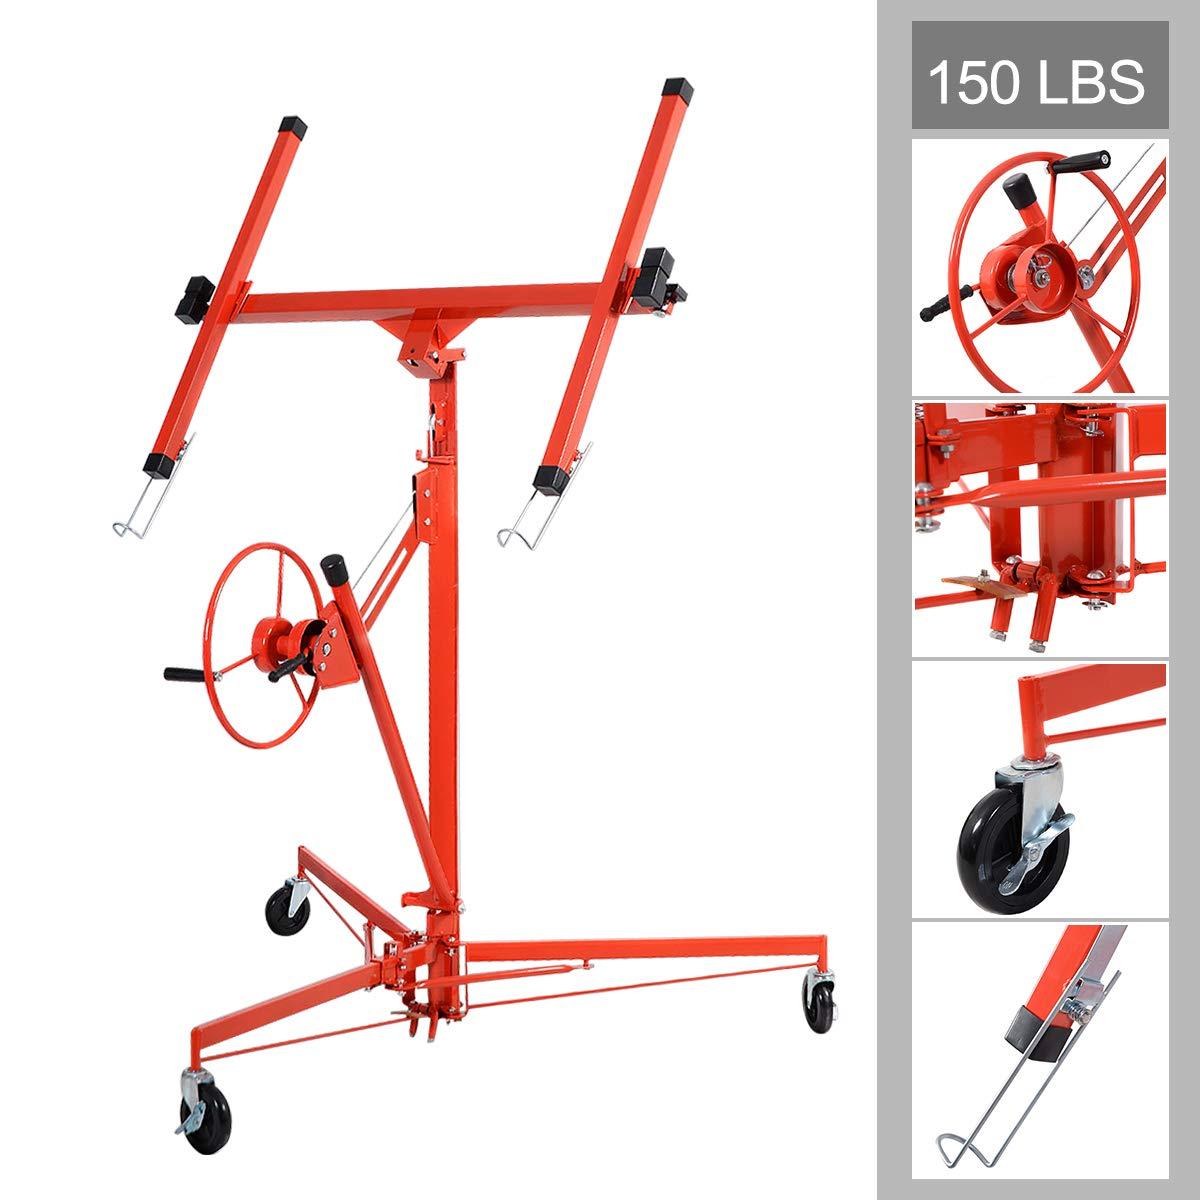 Goplus 11' Drywall Lift Panel List Hoist Jack Lifter Construction Tools Lockable w/Caster Wheel, Red